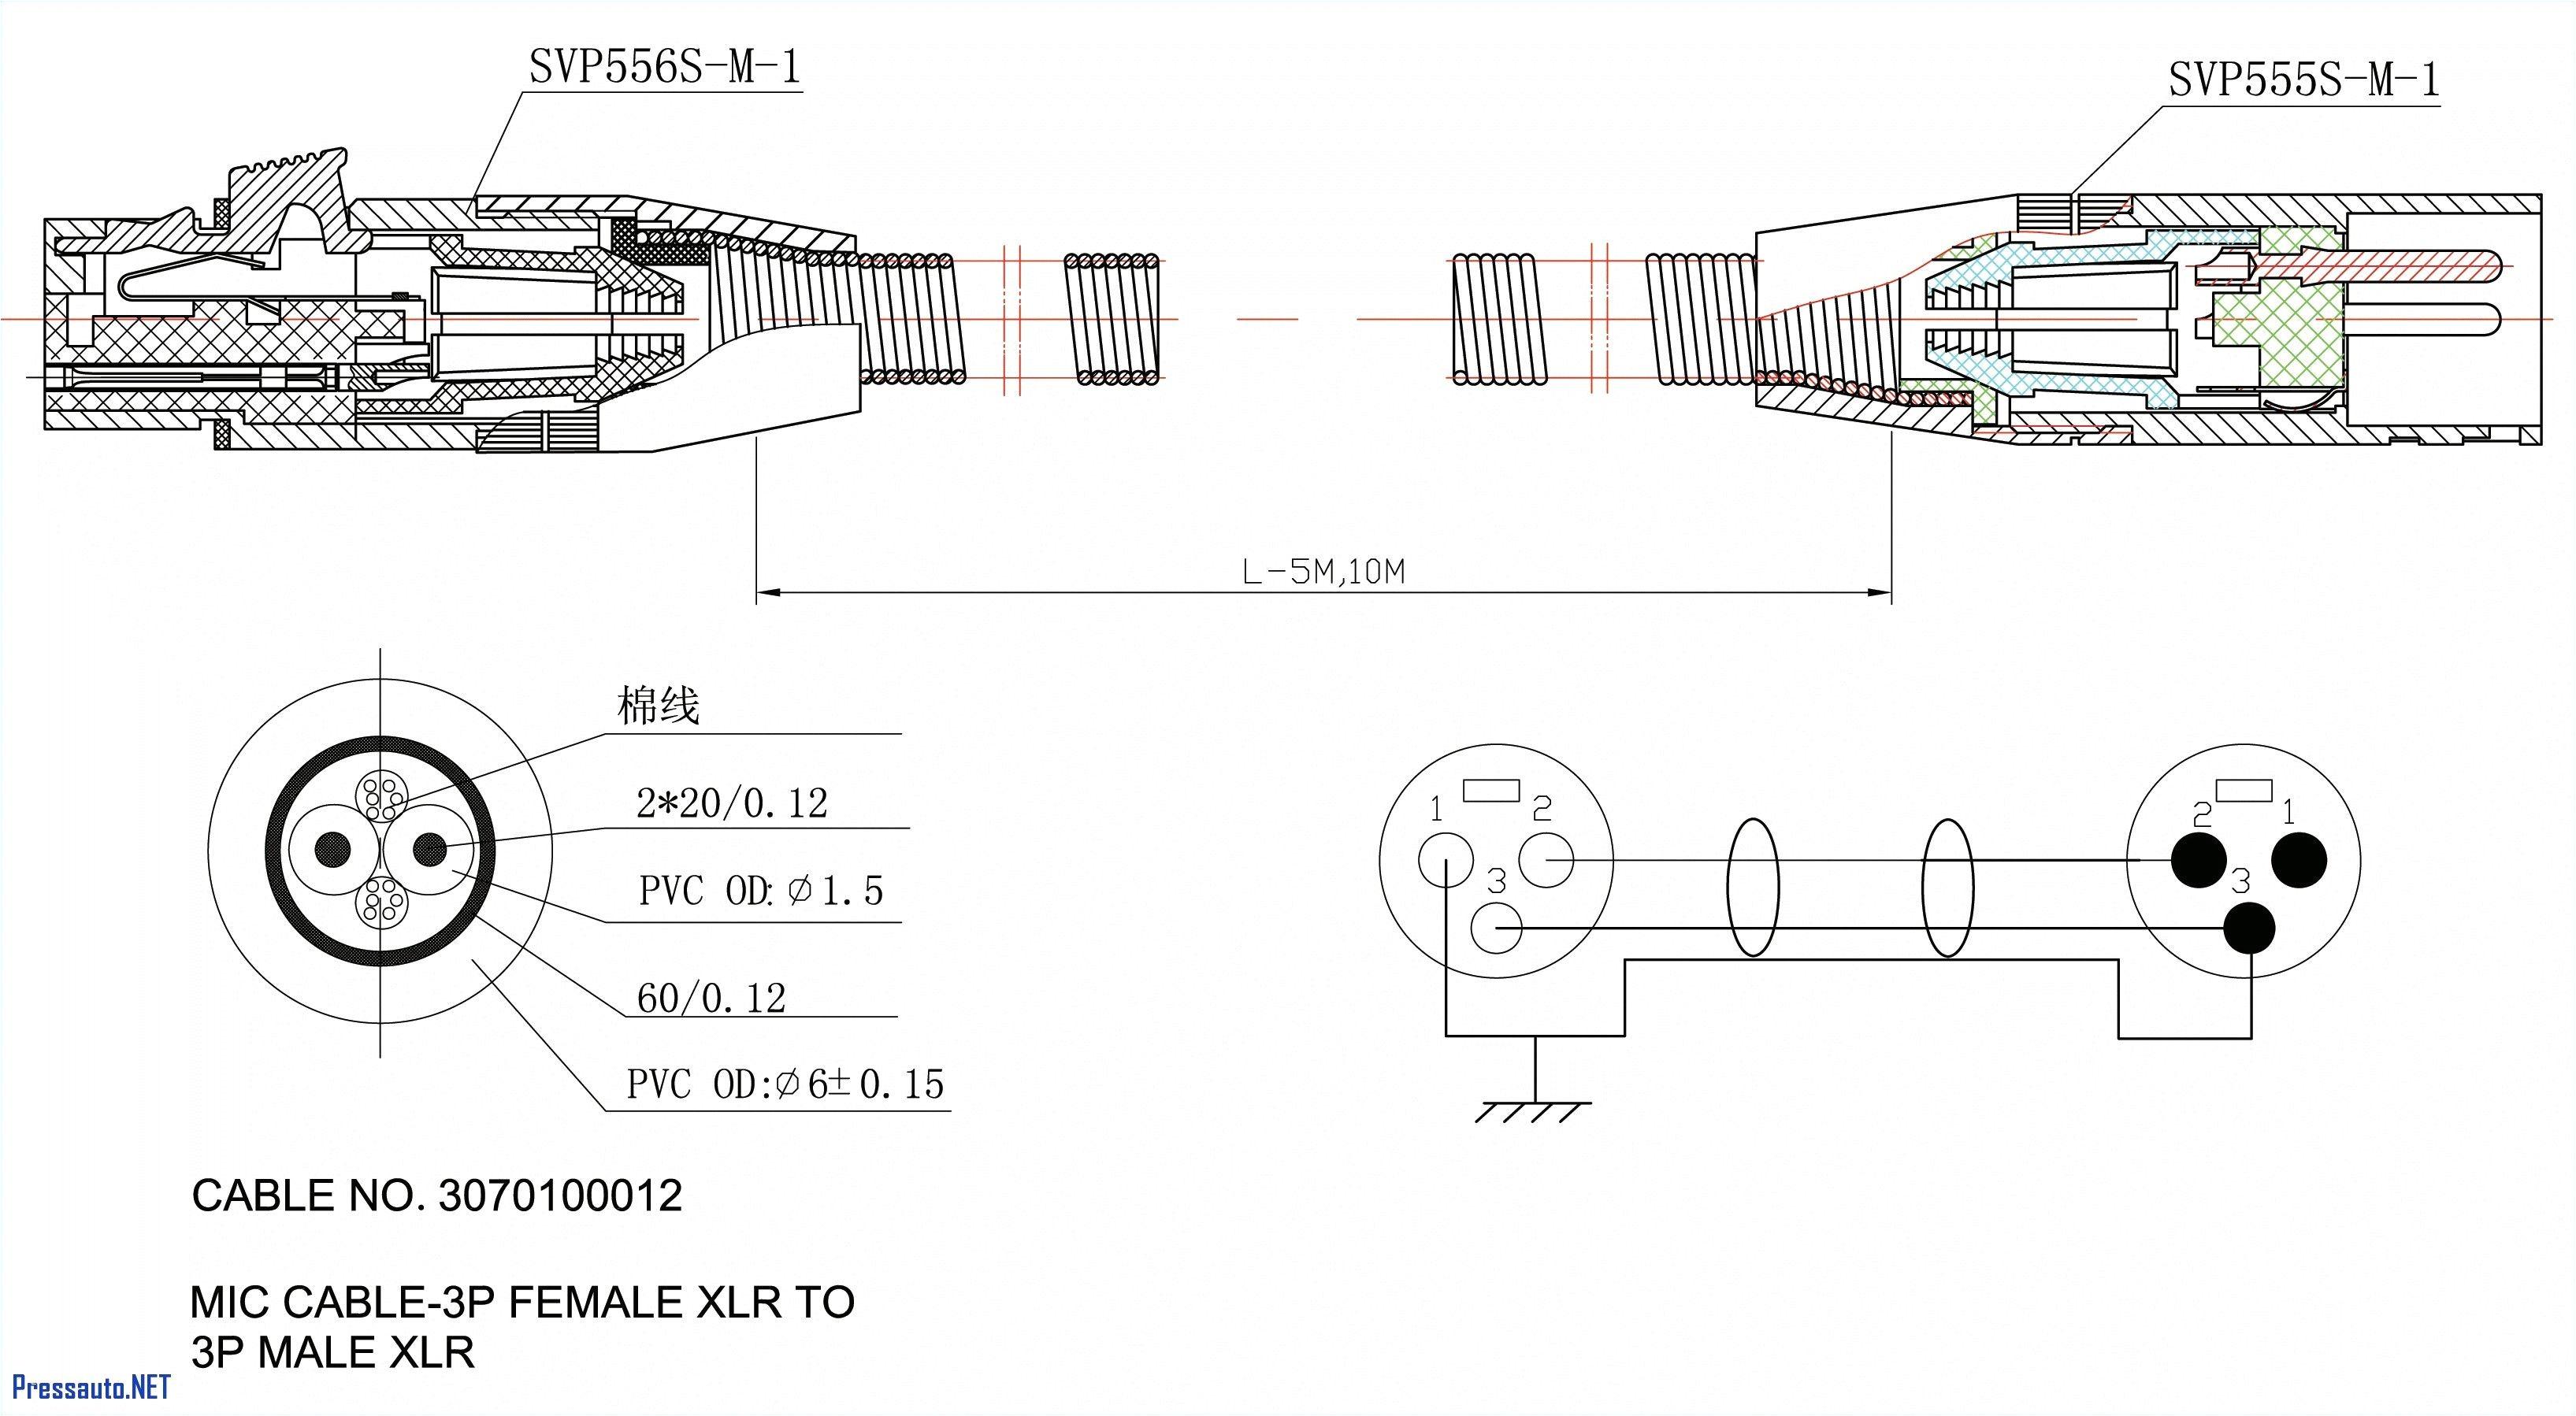 orthman wiring diagram wiring diagram page orthman wiring diagram